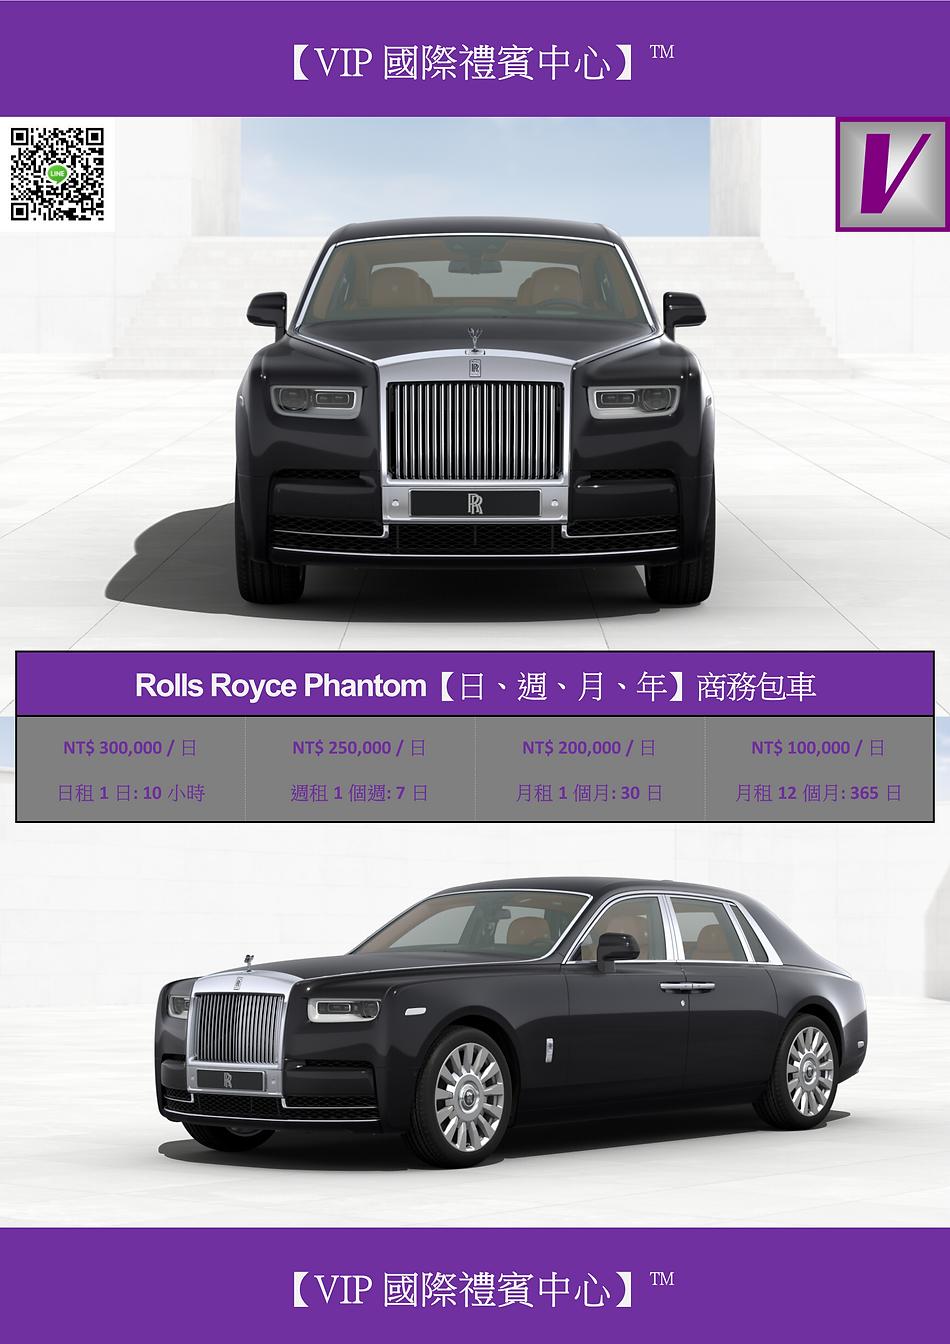 VIP國際禮賓中心 ROLLS ROYCE PHANTOM 臺北市區接送包車